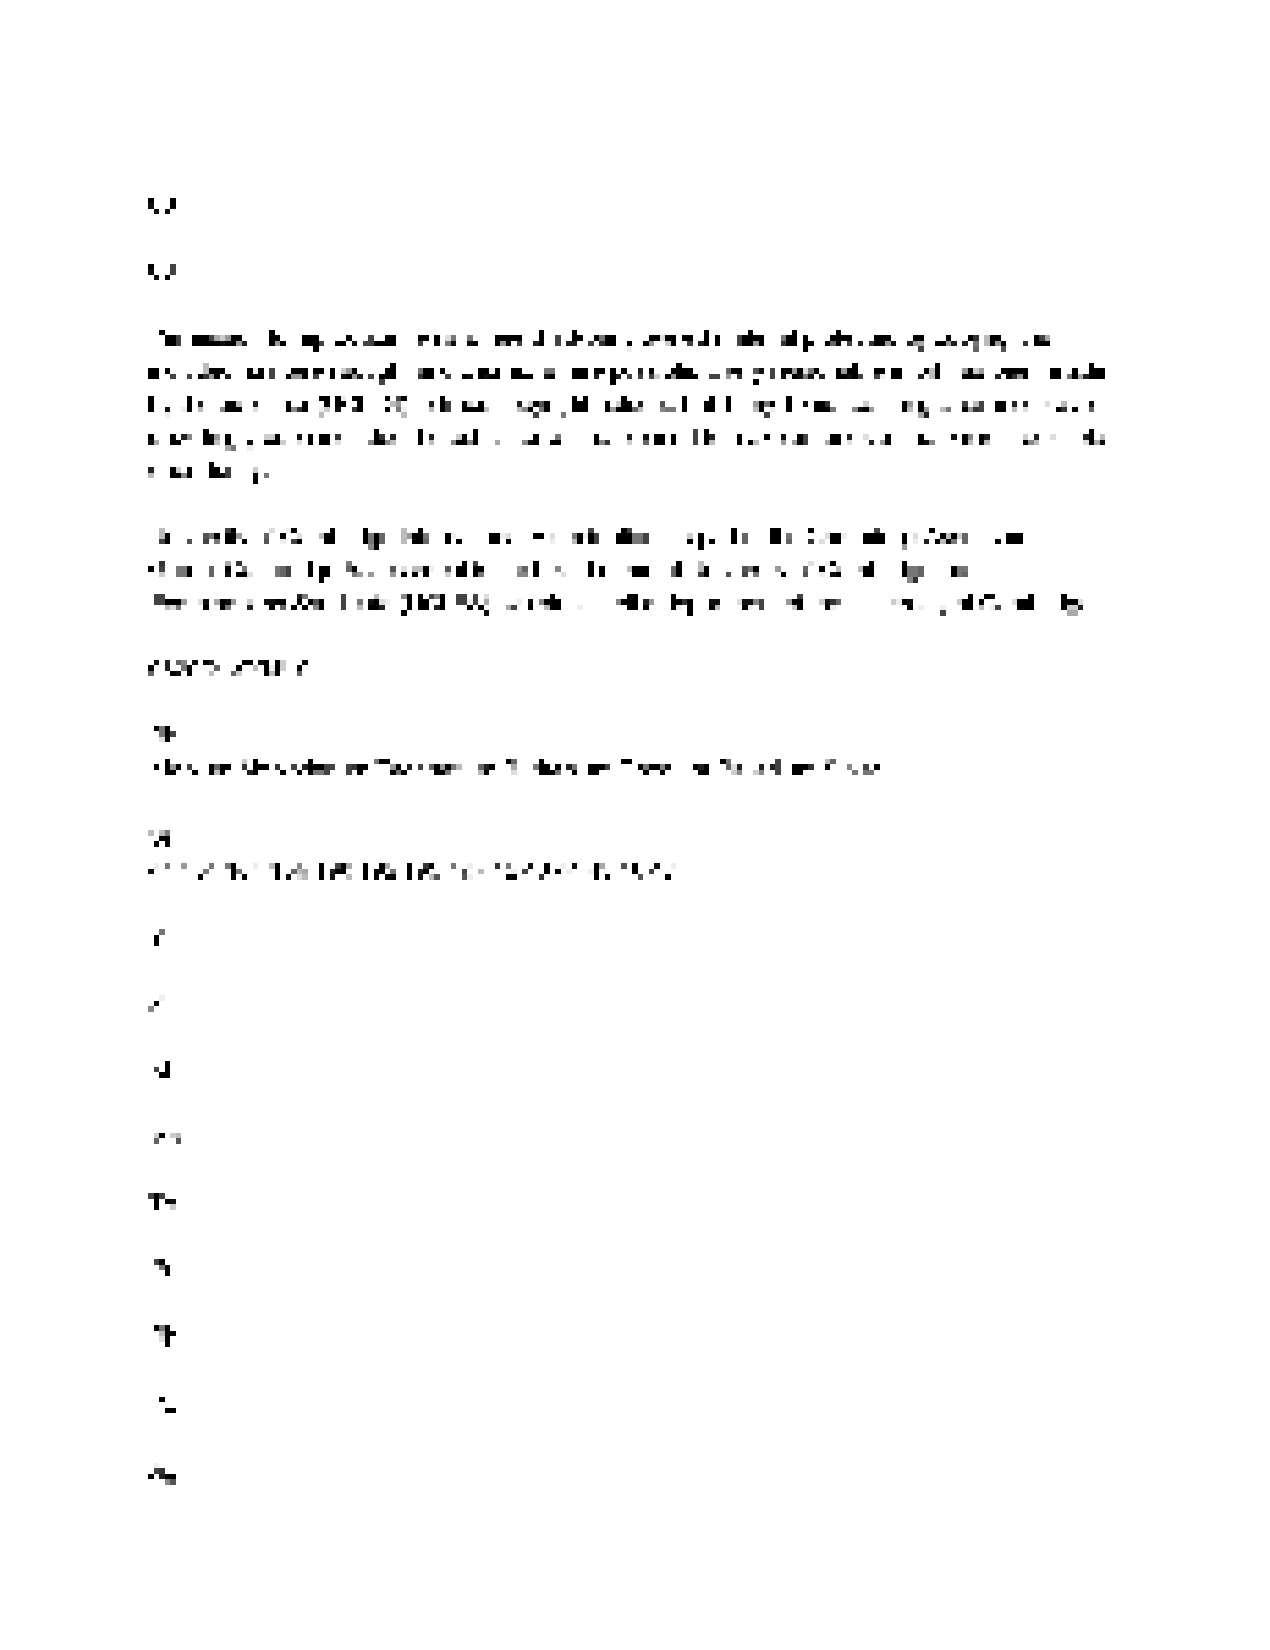 chemistry past exam paper cambridge igcse Past papers past paper/cie as/a2 home » past papers » past paper/cie » o level (igcse) » chemistry 2017 march/feb papers for most igcse.